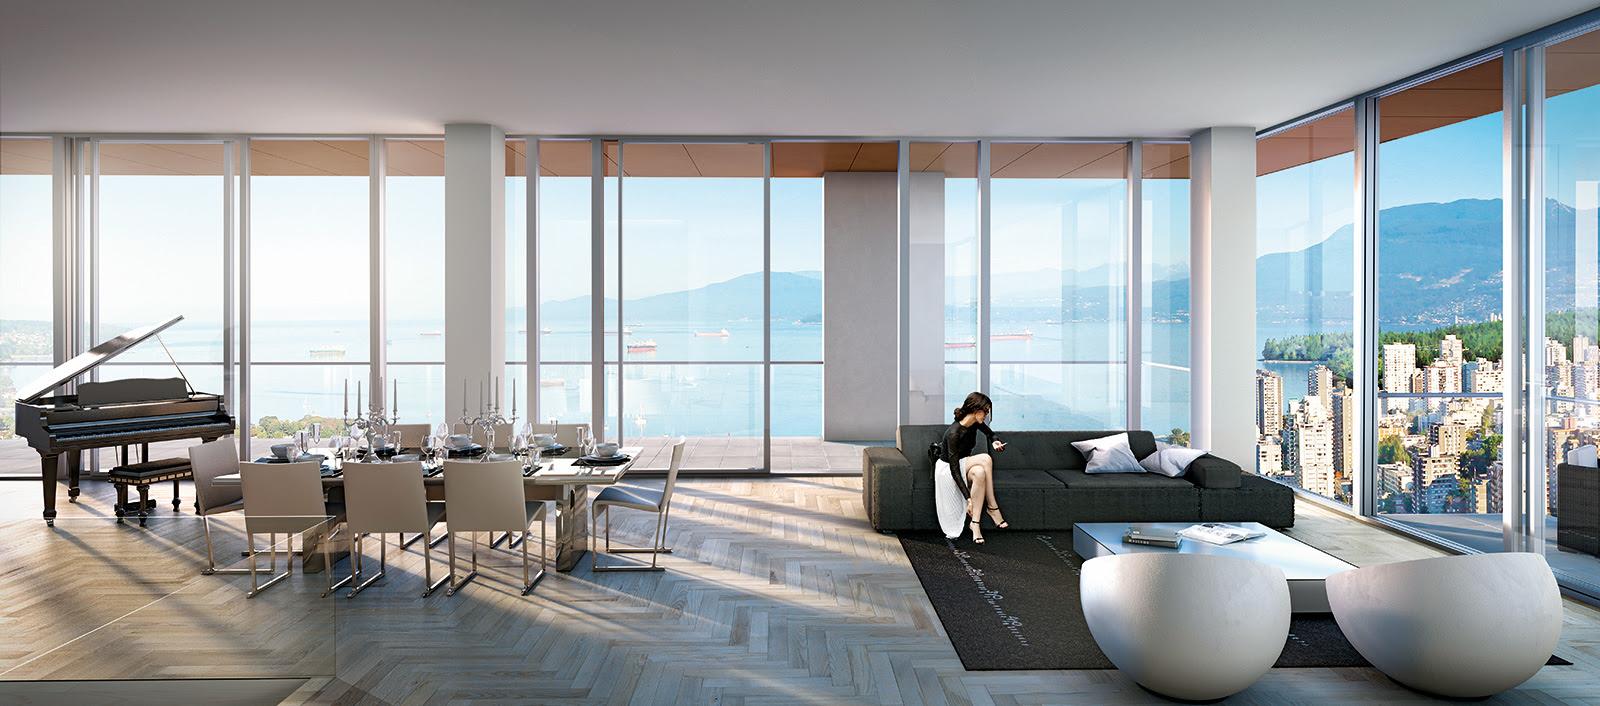 Vancouver House interiors are something to gawk at - Interior Design Programs Vancouver Island Psoriasisguru.com